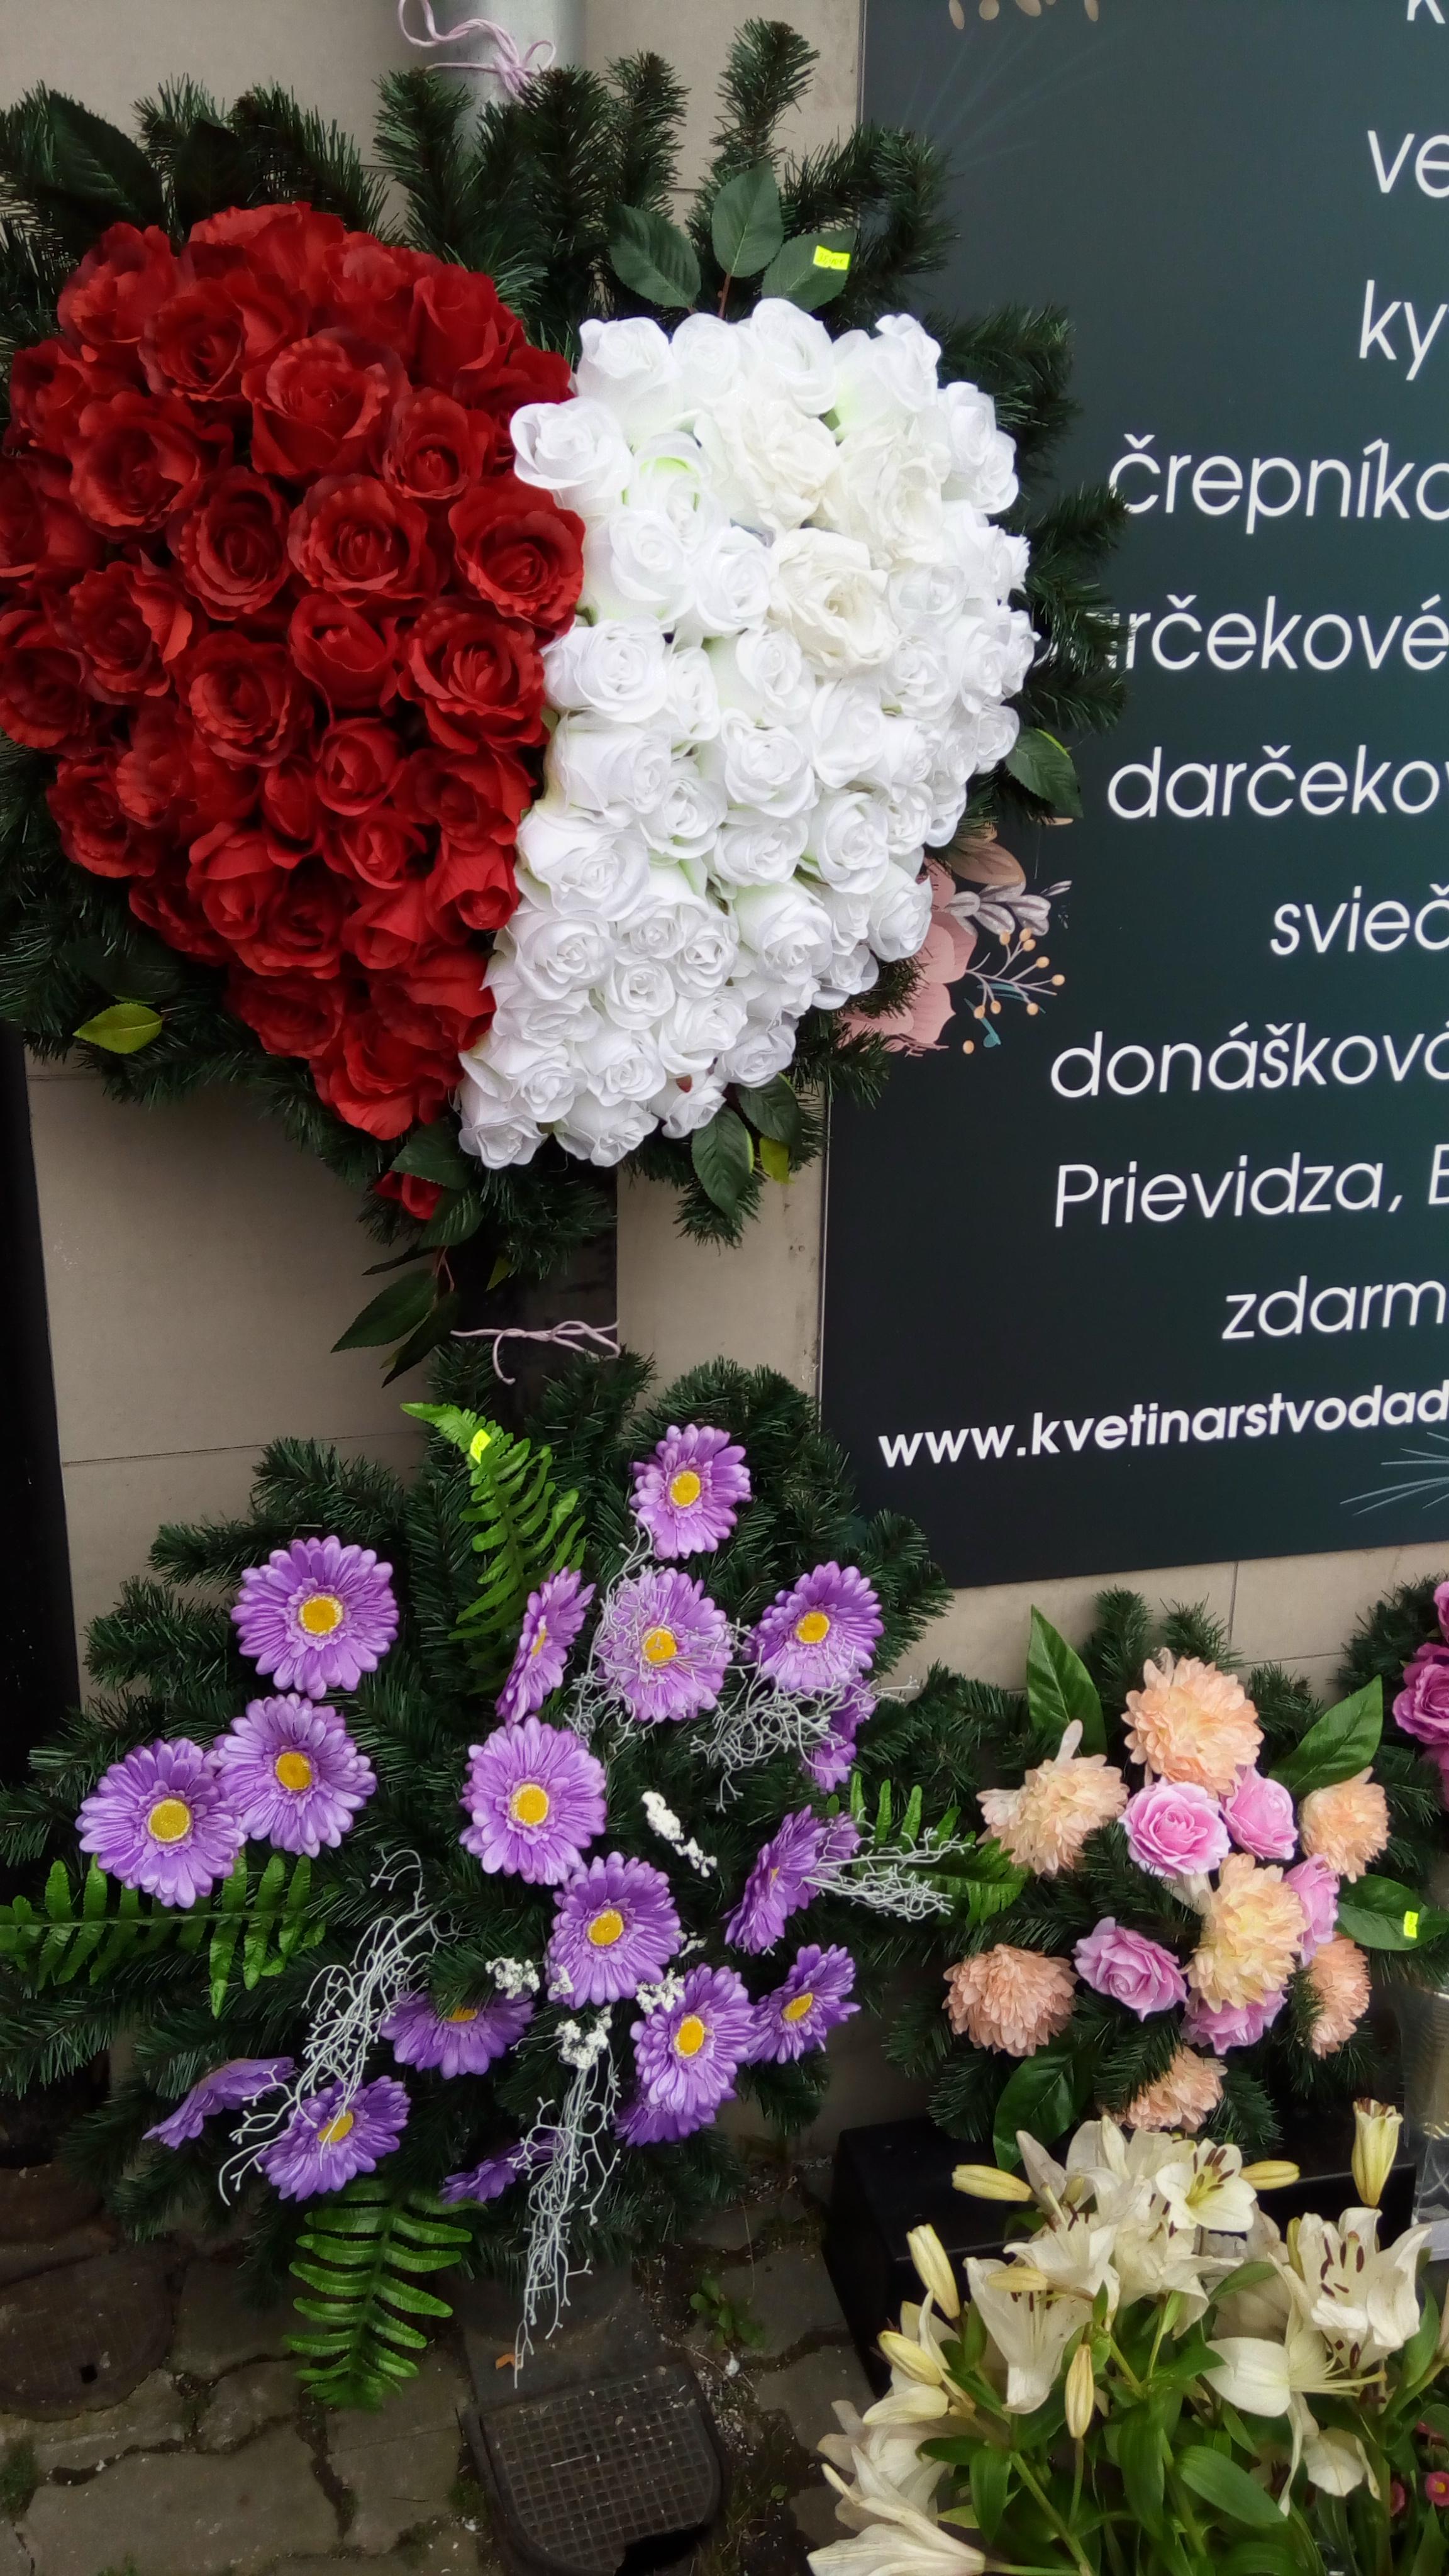 Kvetinárstvo DADA 3